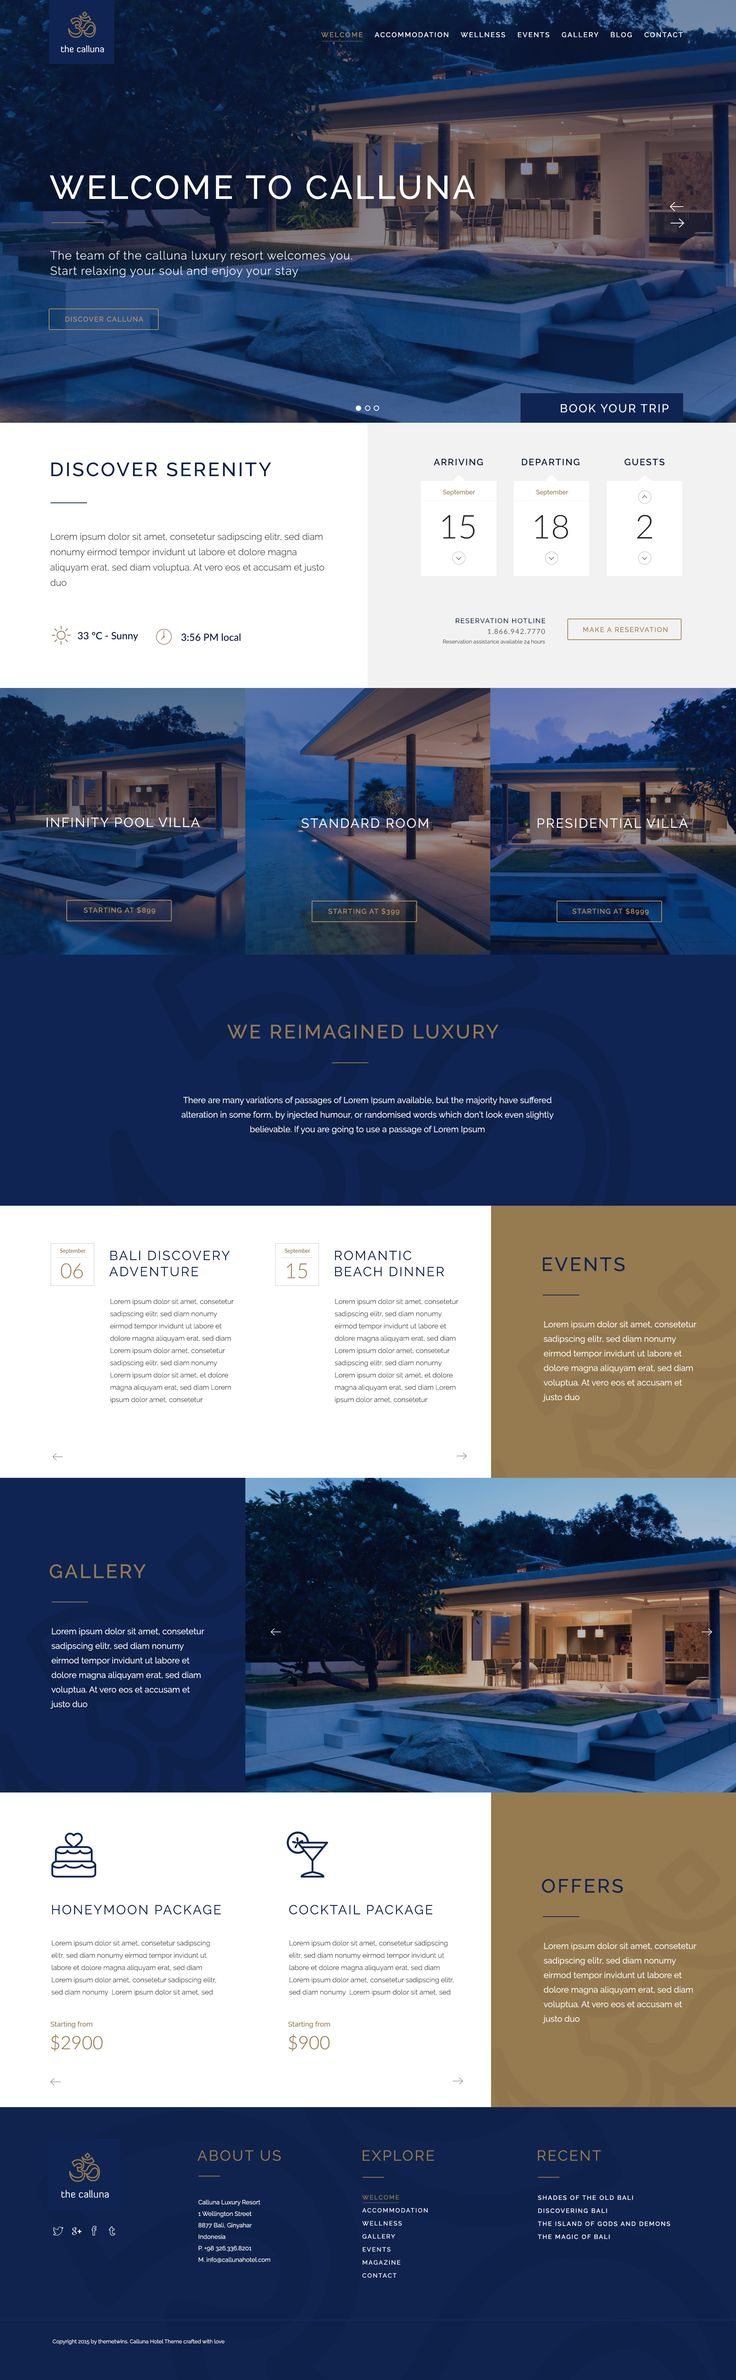 Calluna - Hotel, Resort & Spa PSD Template - PSD Templates | ThemeForest